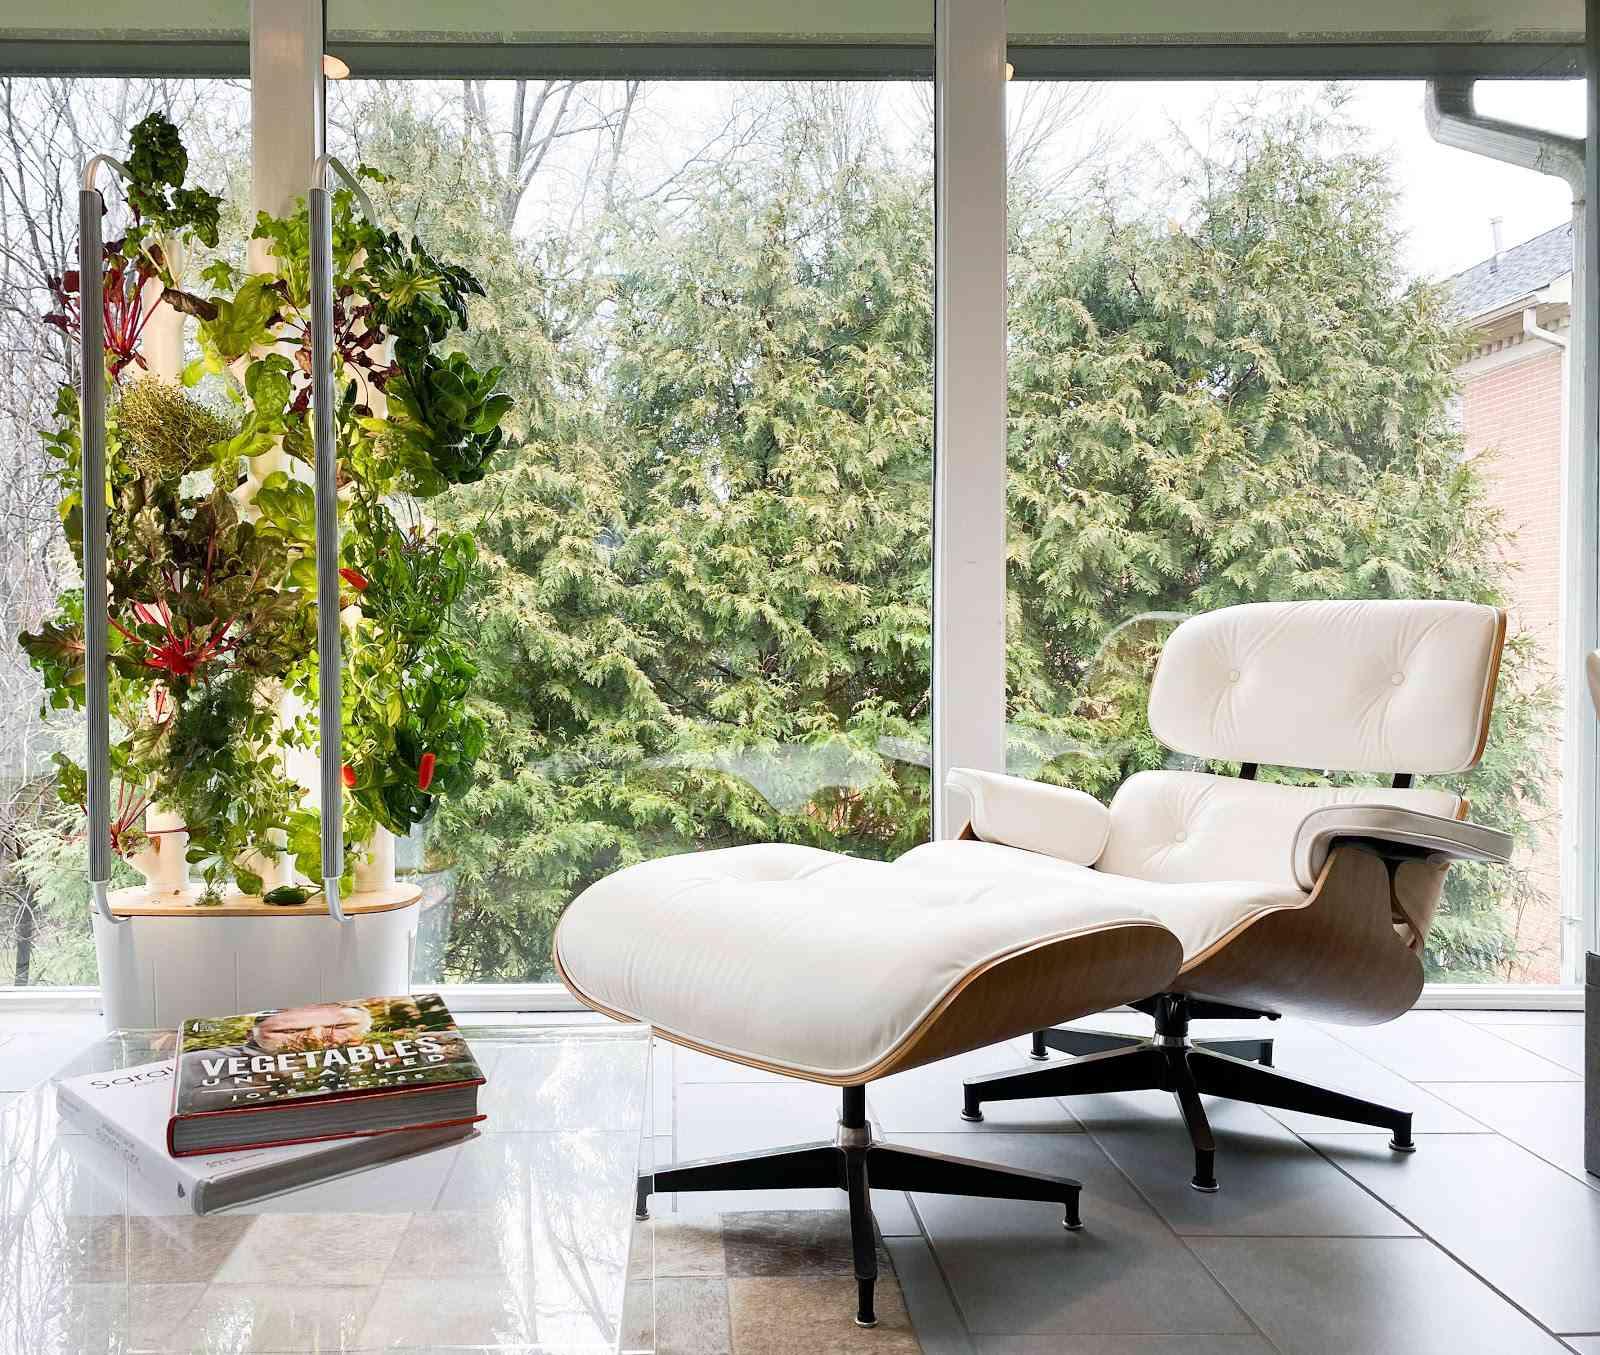 An indoor garden by Gardyn.